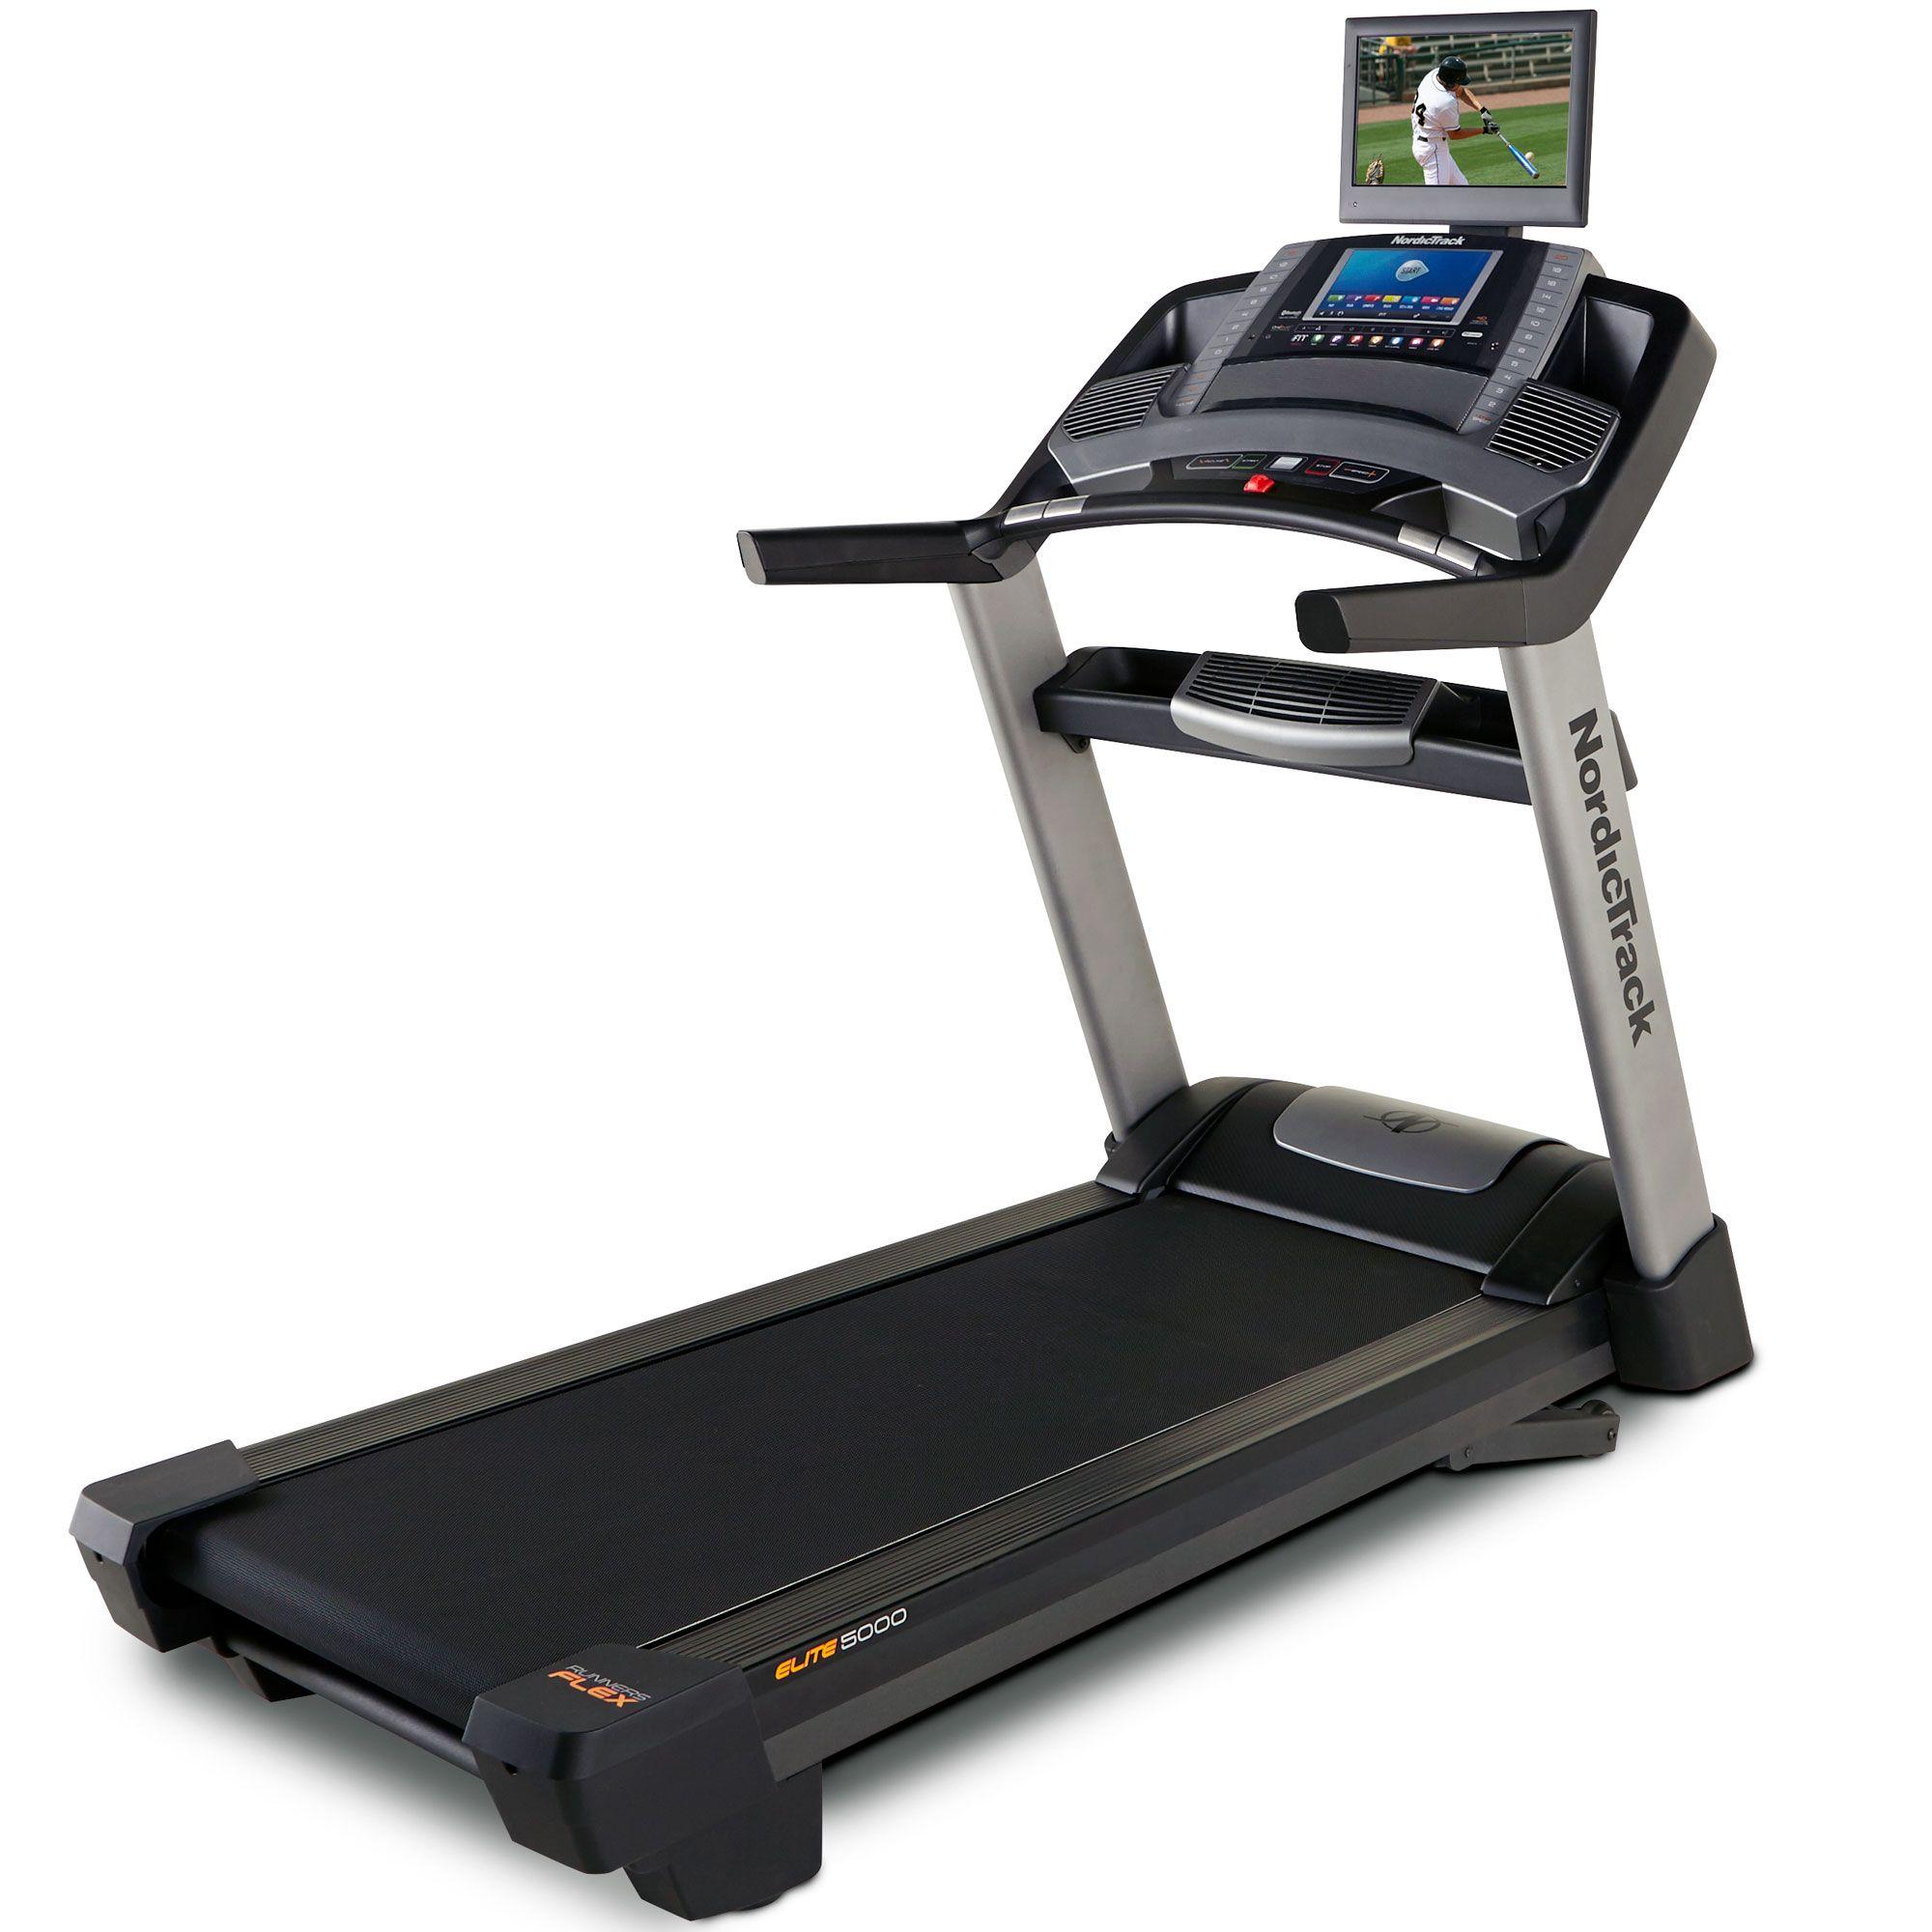 Treadmill Lubricant Nordictrack: NordicTrack Elite 5000 Treadmill